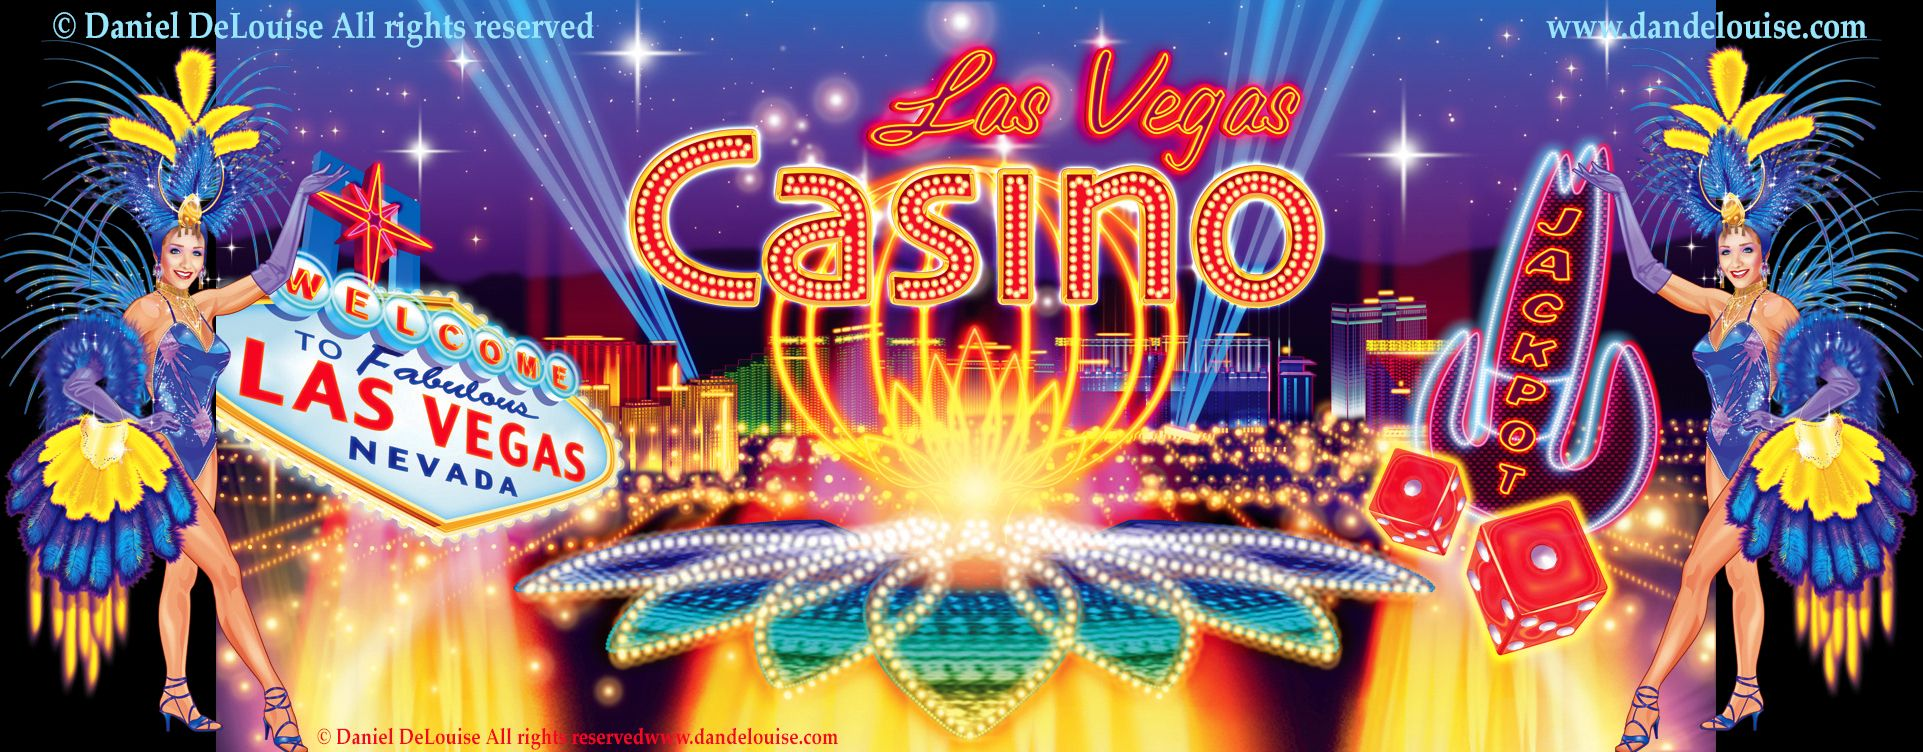 Las vegas casinos online casino slot machine game online